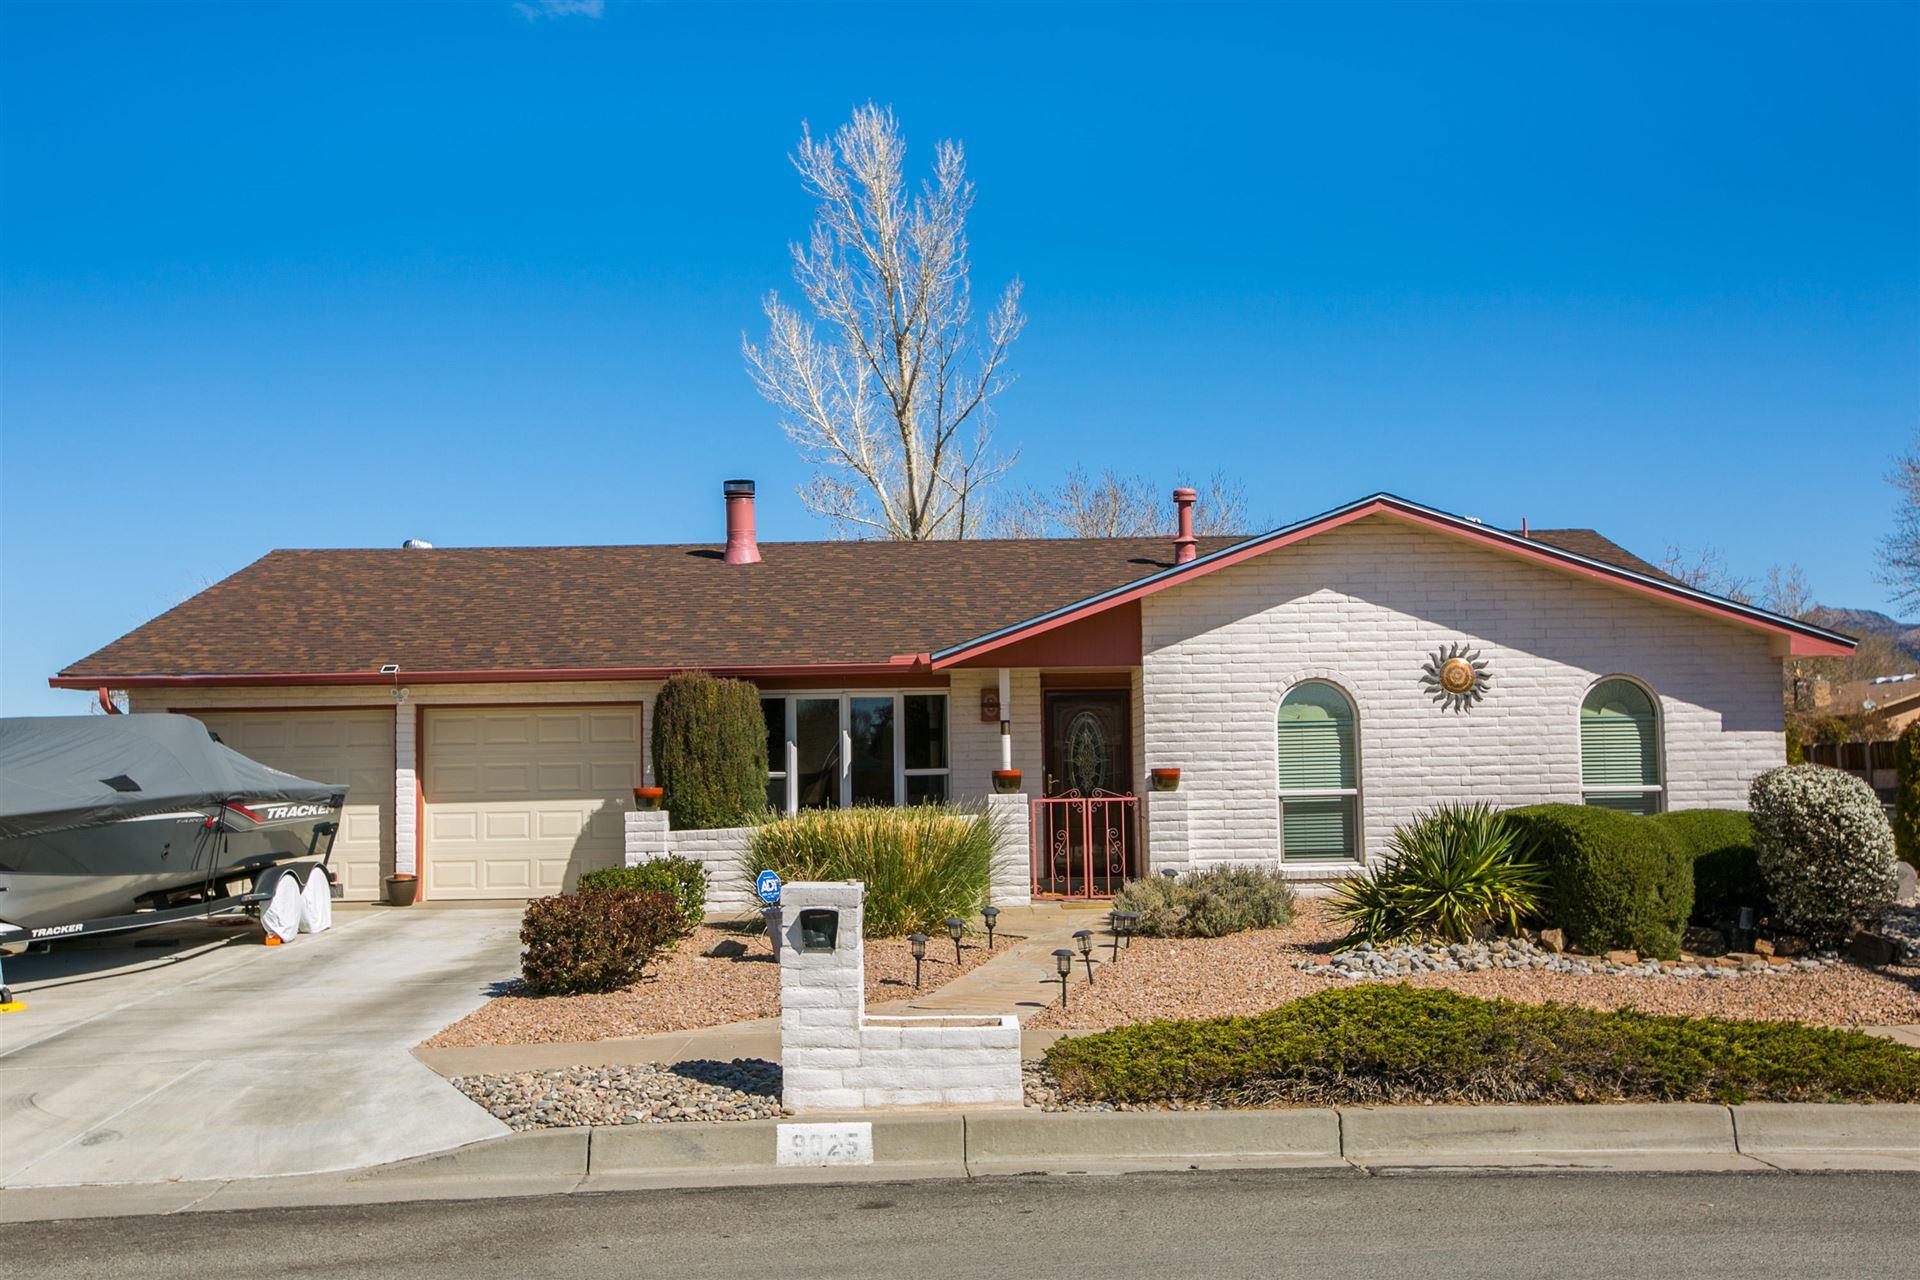 9025 Freedom Way NE, Albuquerque, NM 87109 - MLS#: 988252